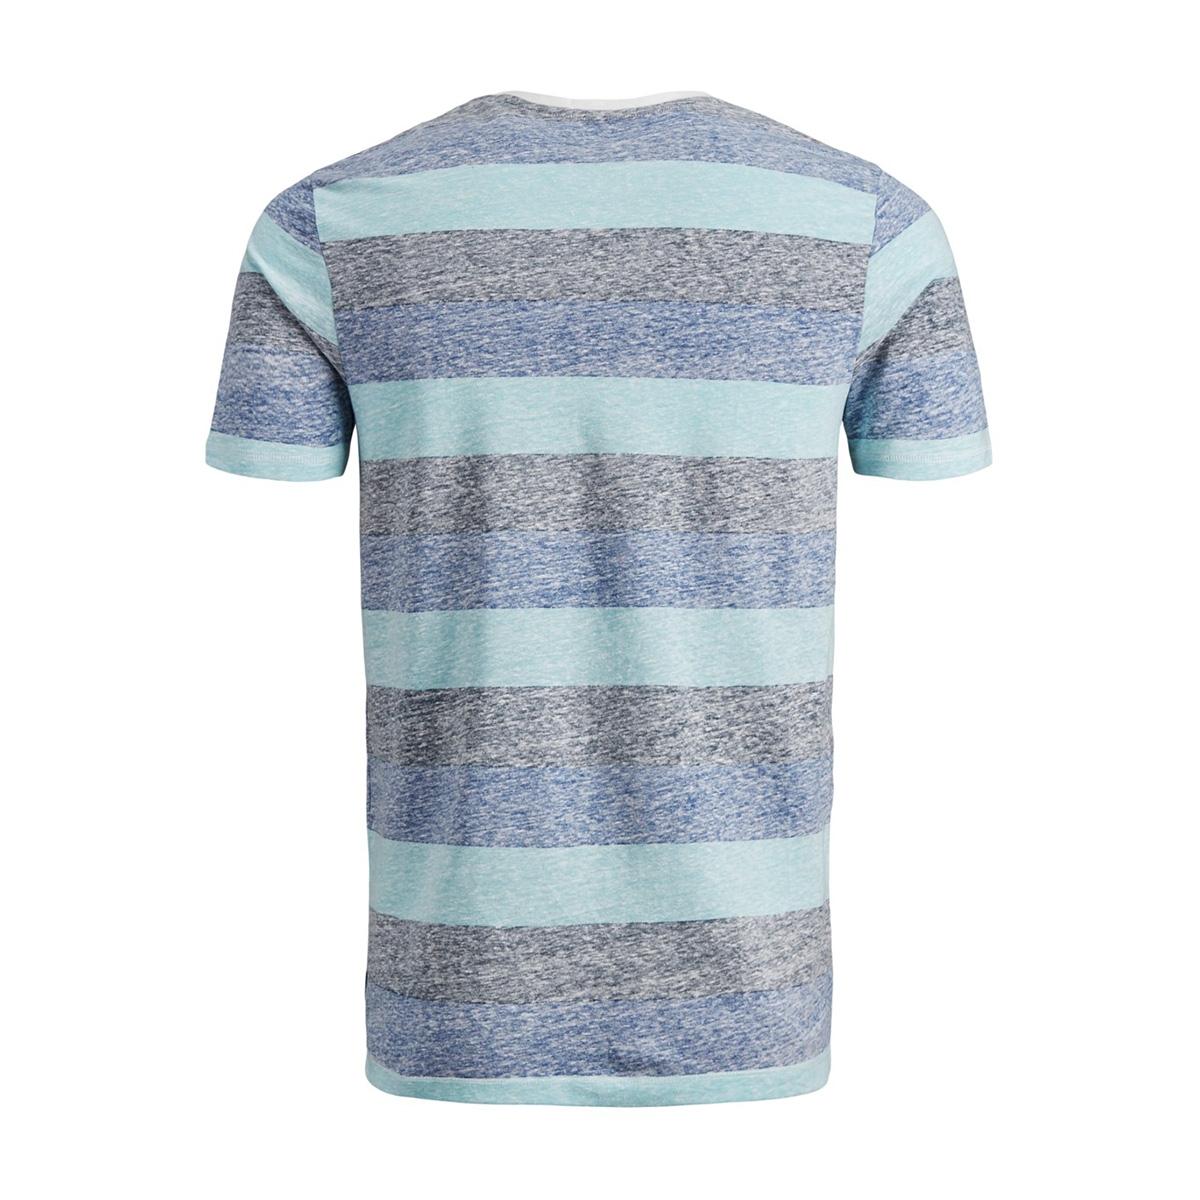 jorsider tee ss crew neck 12152722 jack & jones t-shirt aqua sky/slim